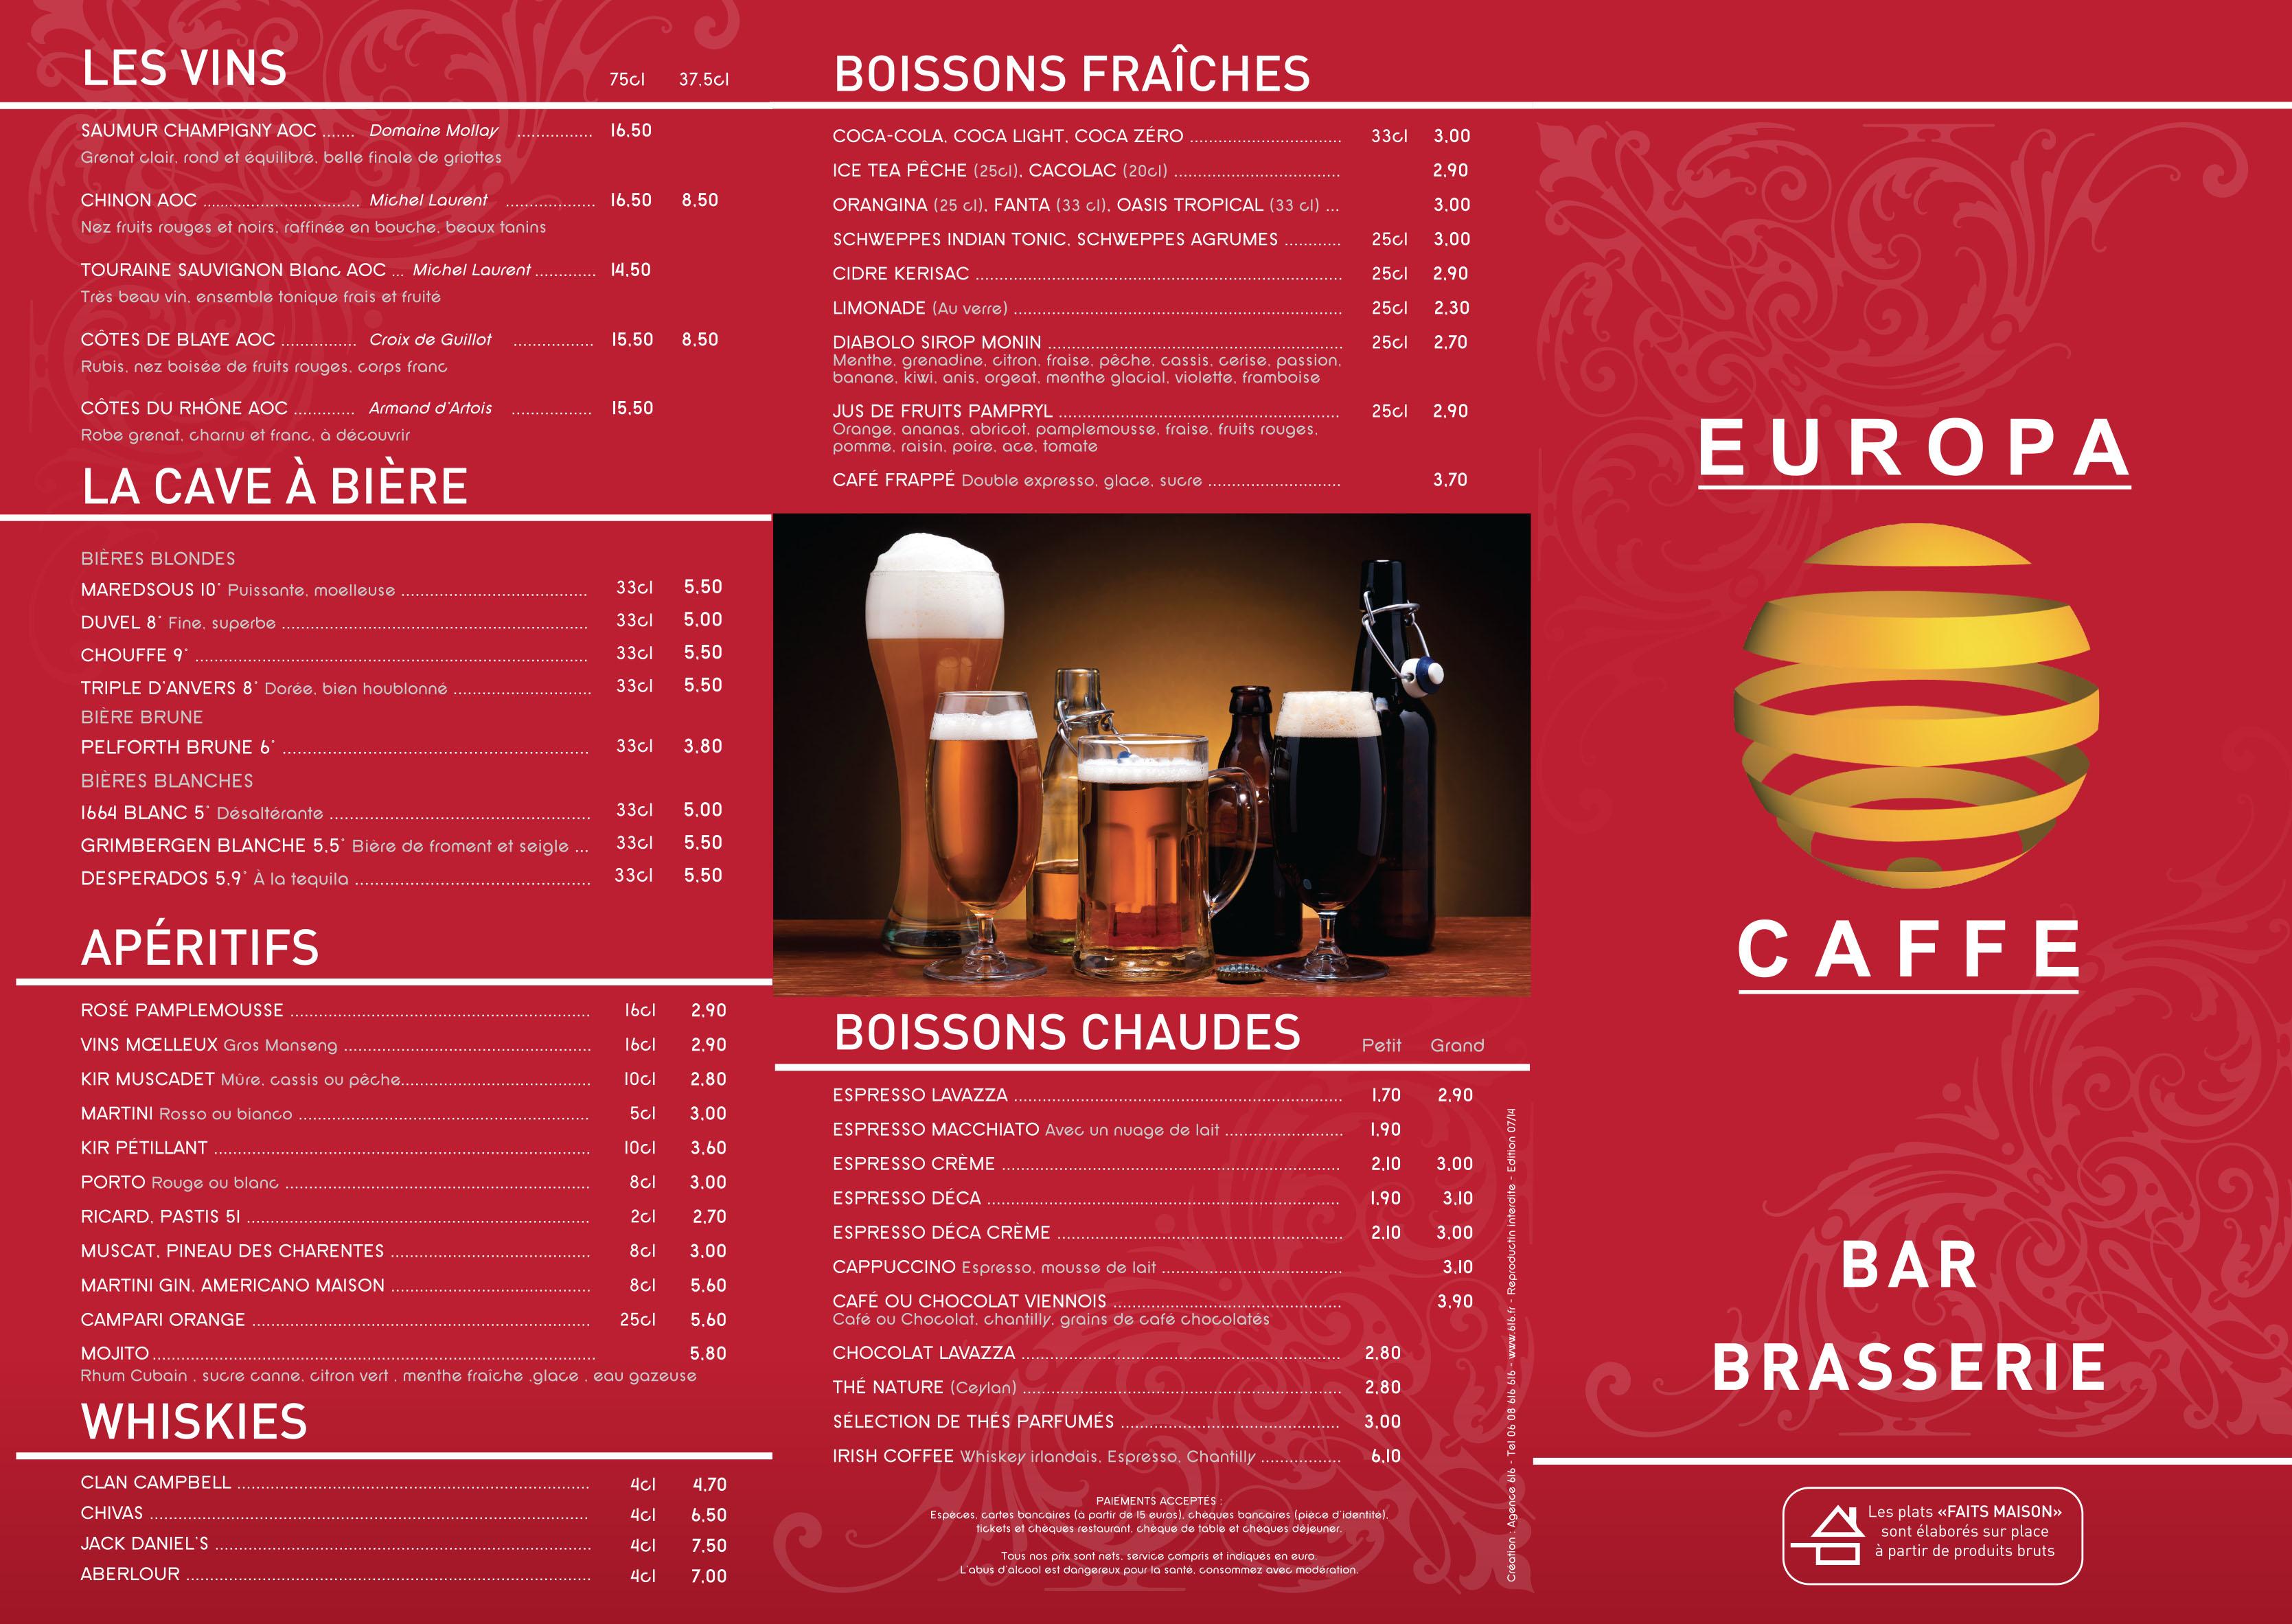 Europa Caffee